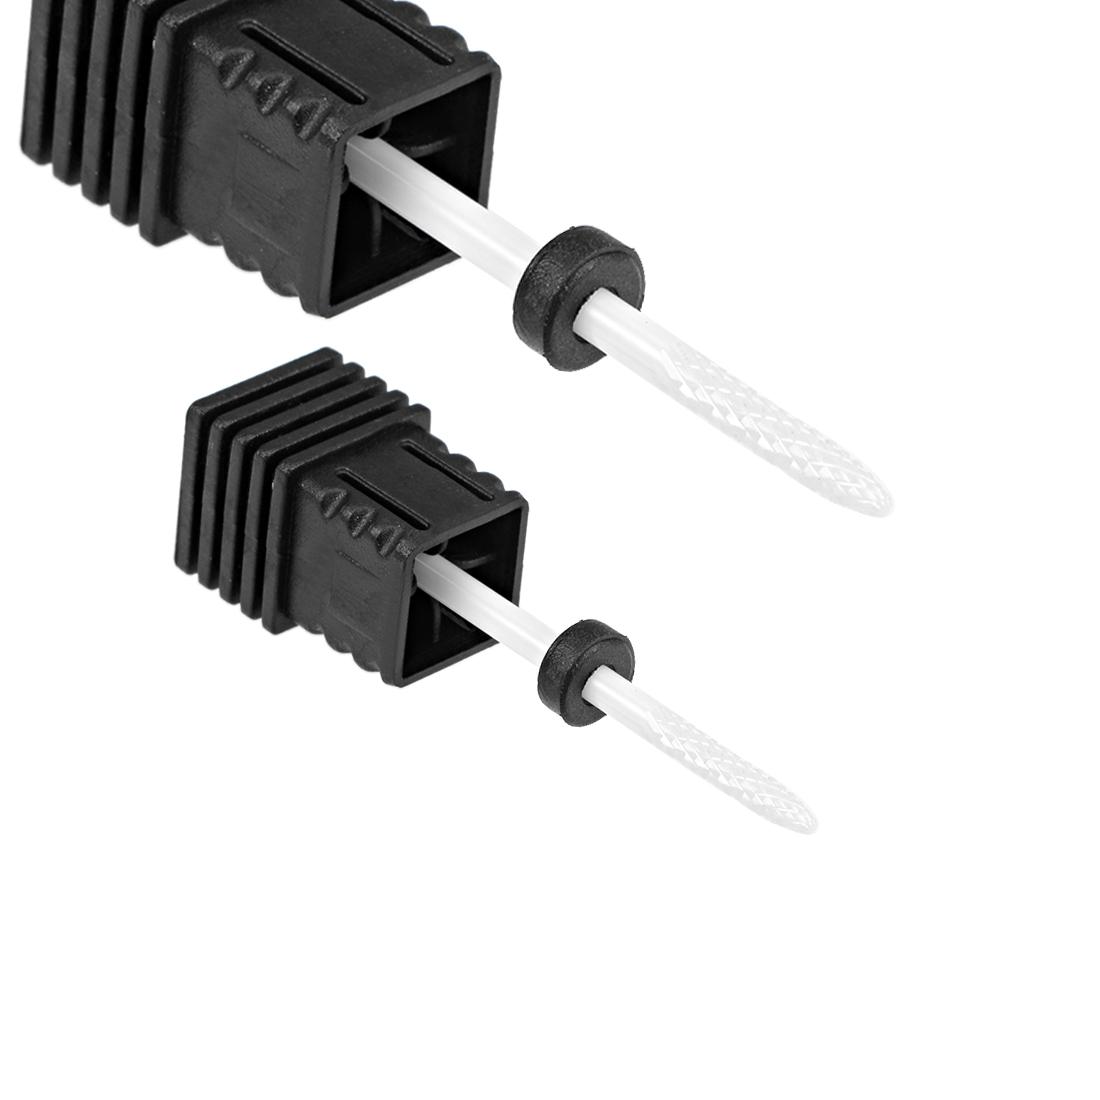 2pcs Ceramic Nail Drill Bits 3/32 inch (Extra Coarse Grit) Nails File Bit